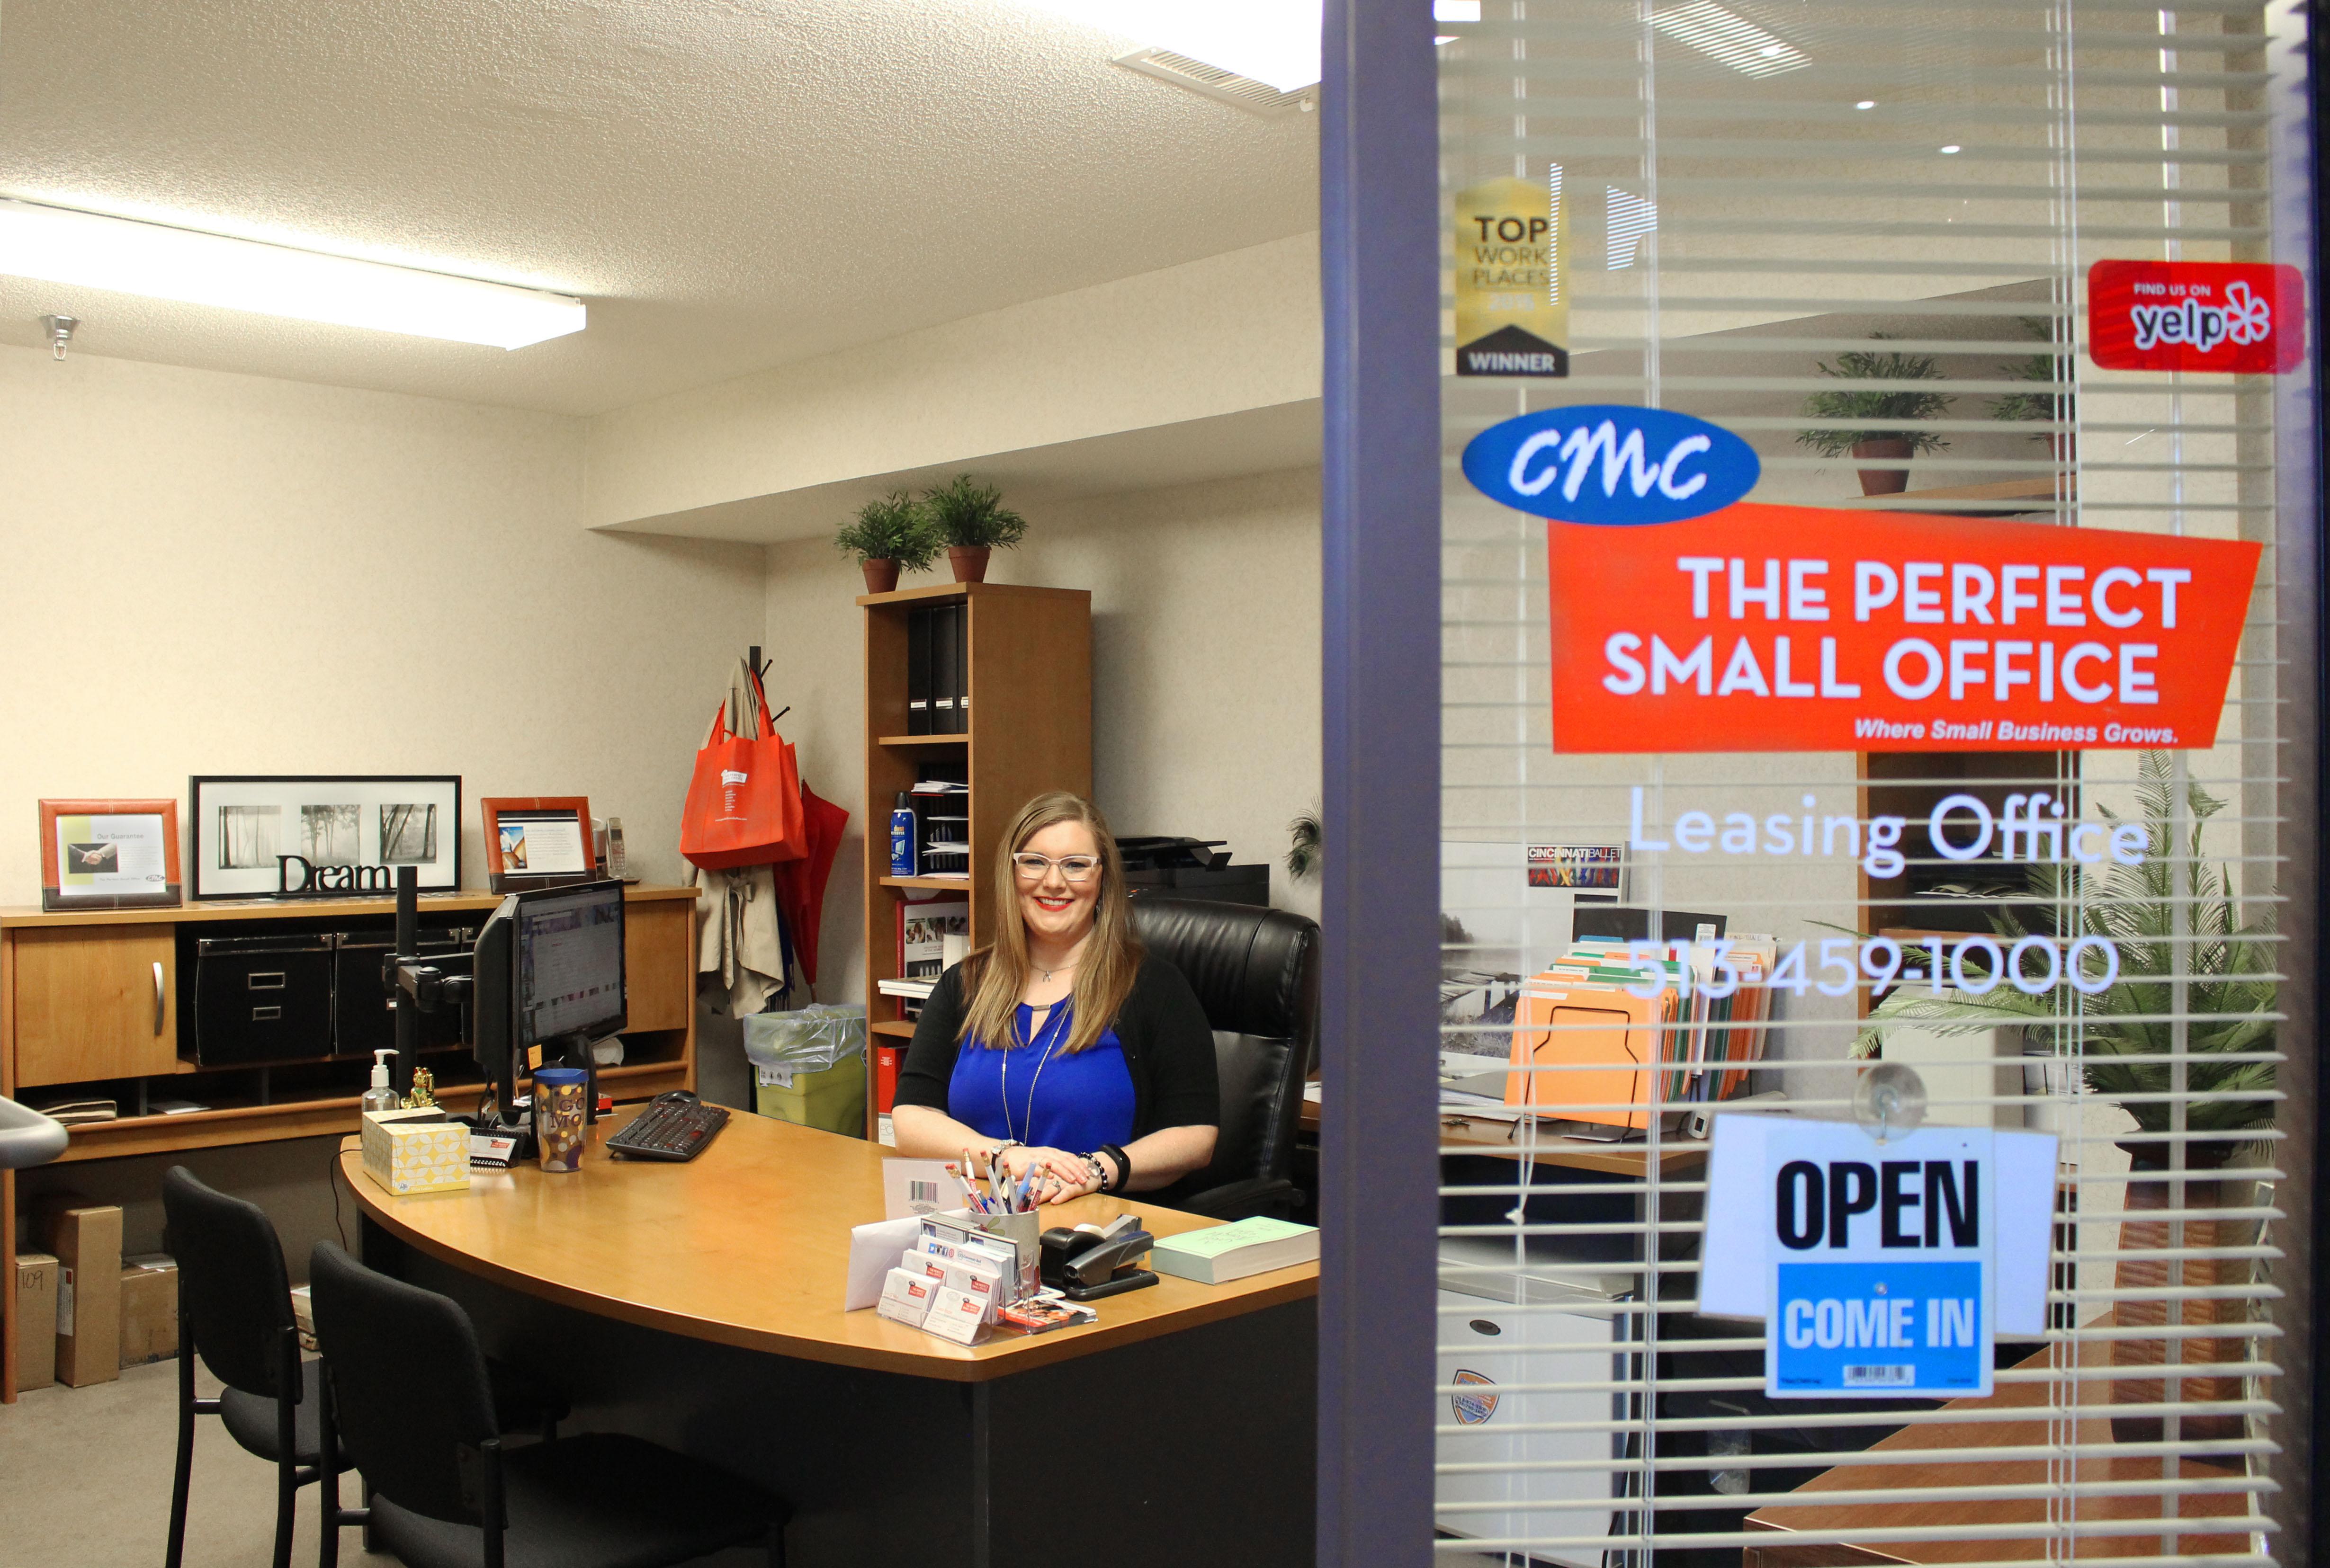 Cmc S The Perfect Small Office Mason In Mason Oh Meet